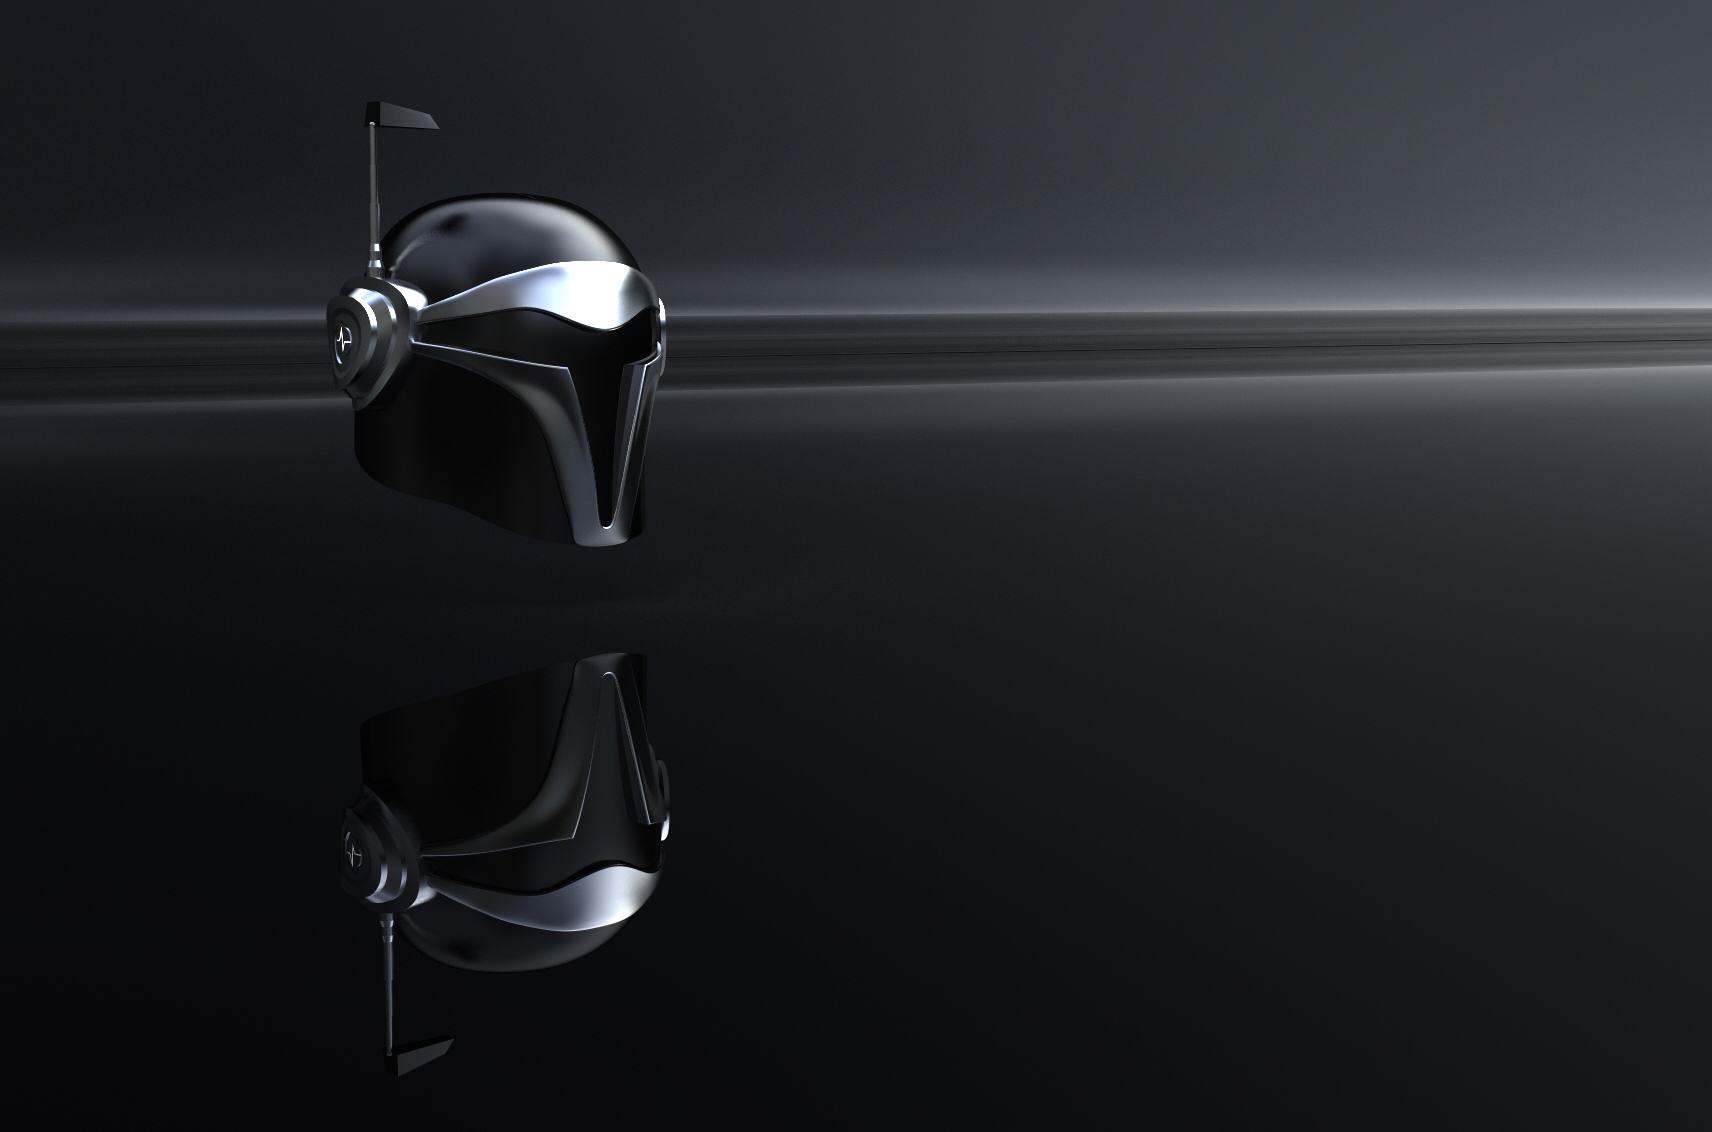 Helmet Concept: Daft Punk x Star Wars (2017)